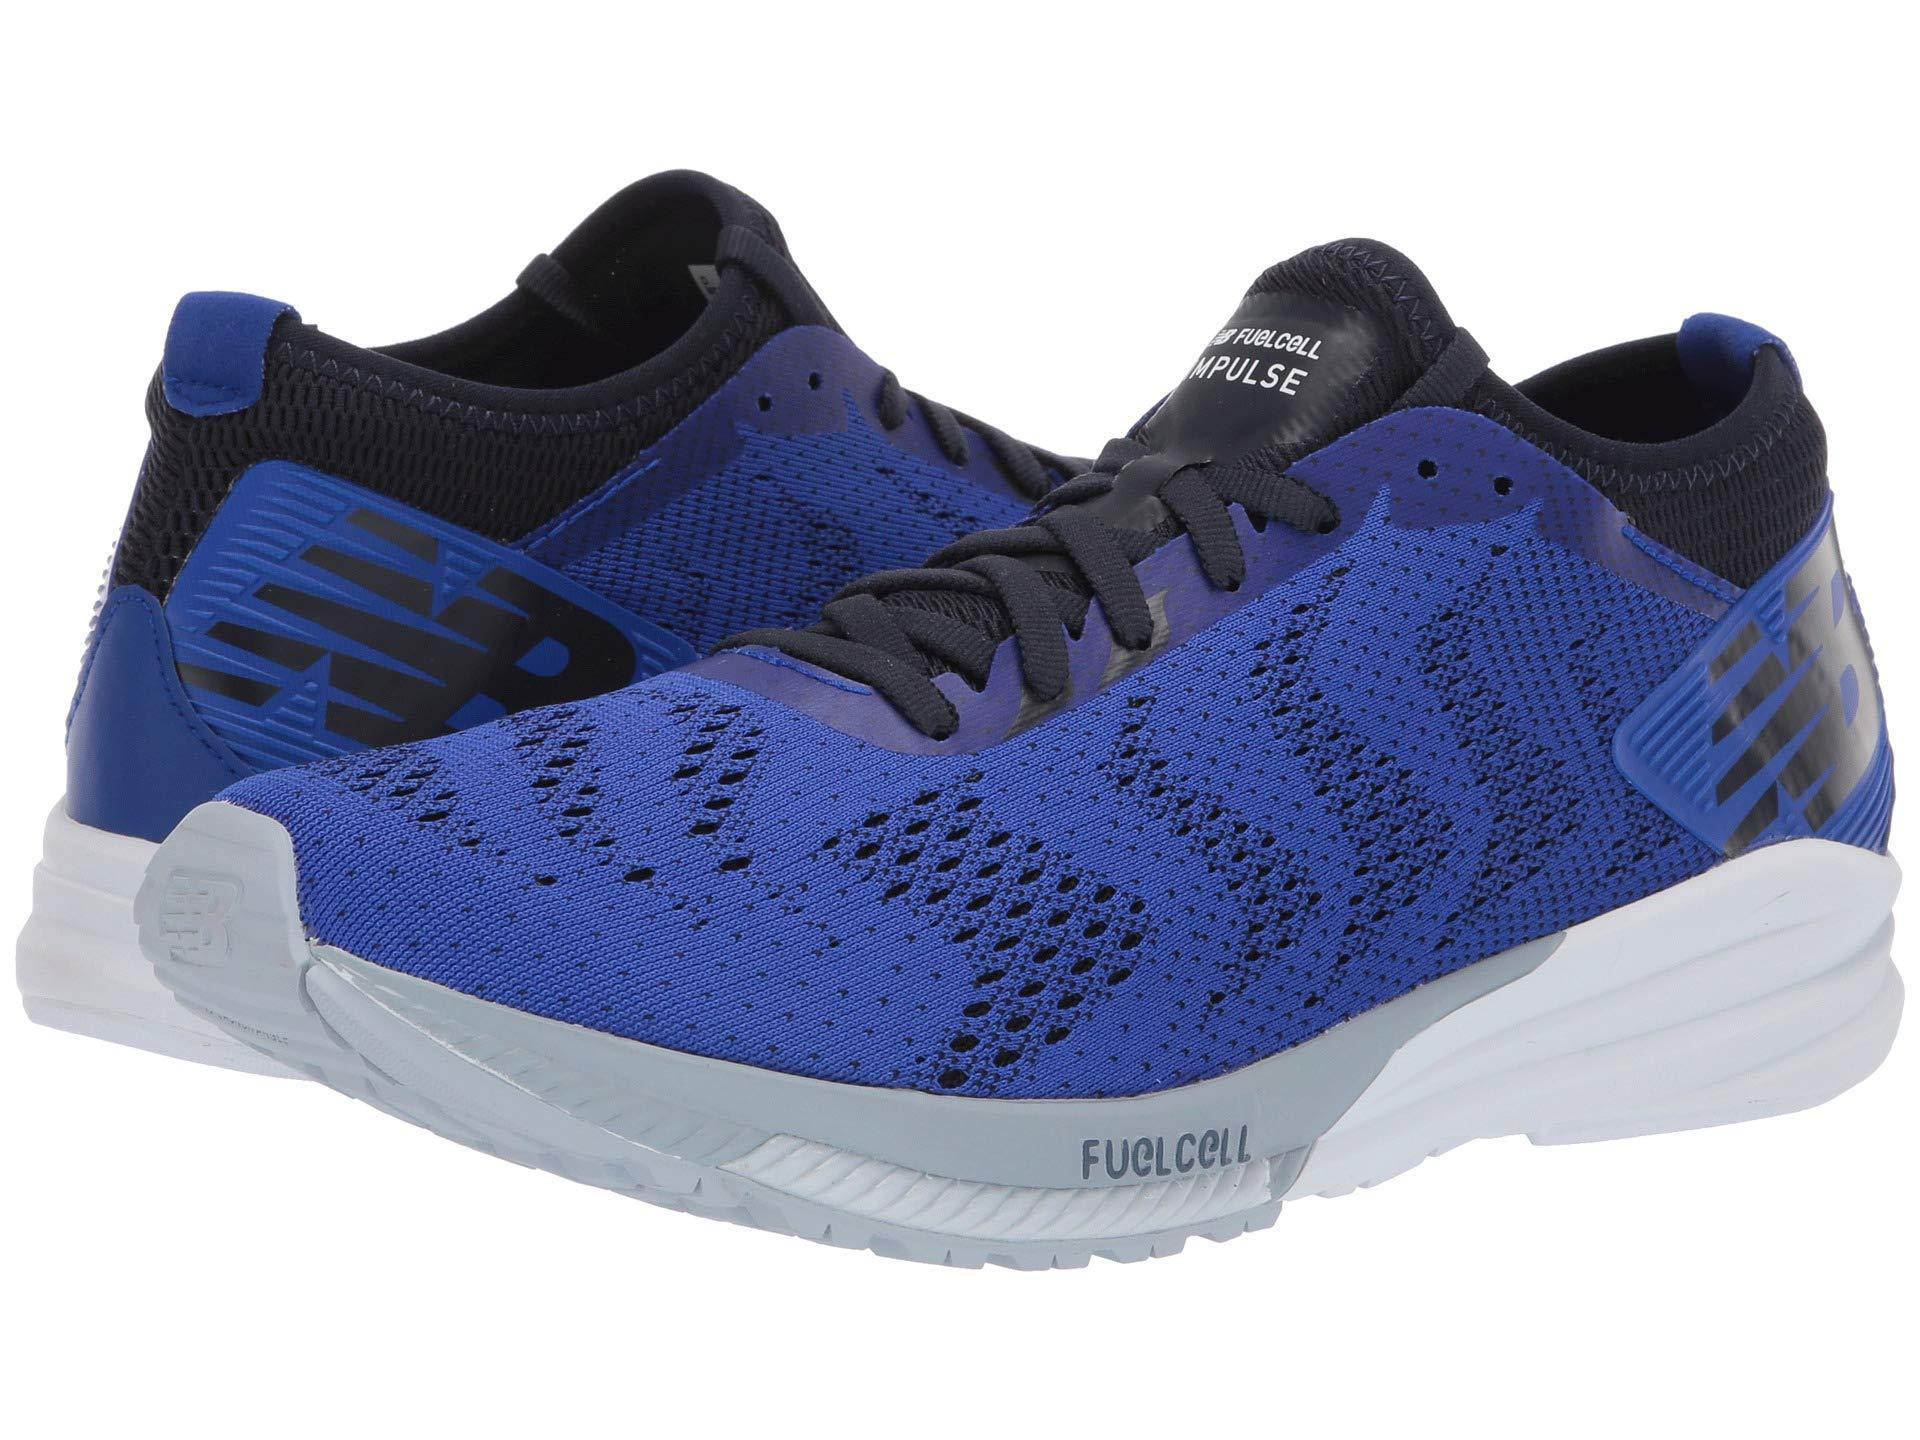 132ea1fc7e4d6 New Balance. Blue Fuelcell Impulse (black/copper) Men's Running Shoes